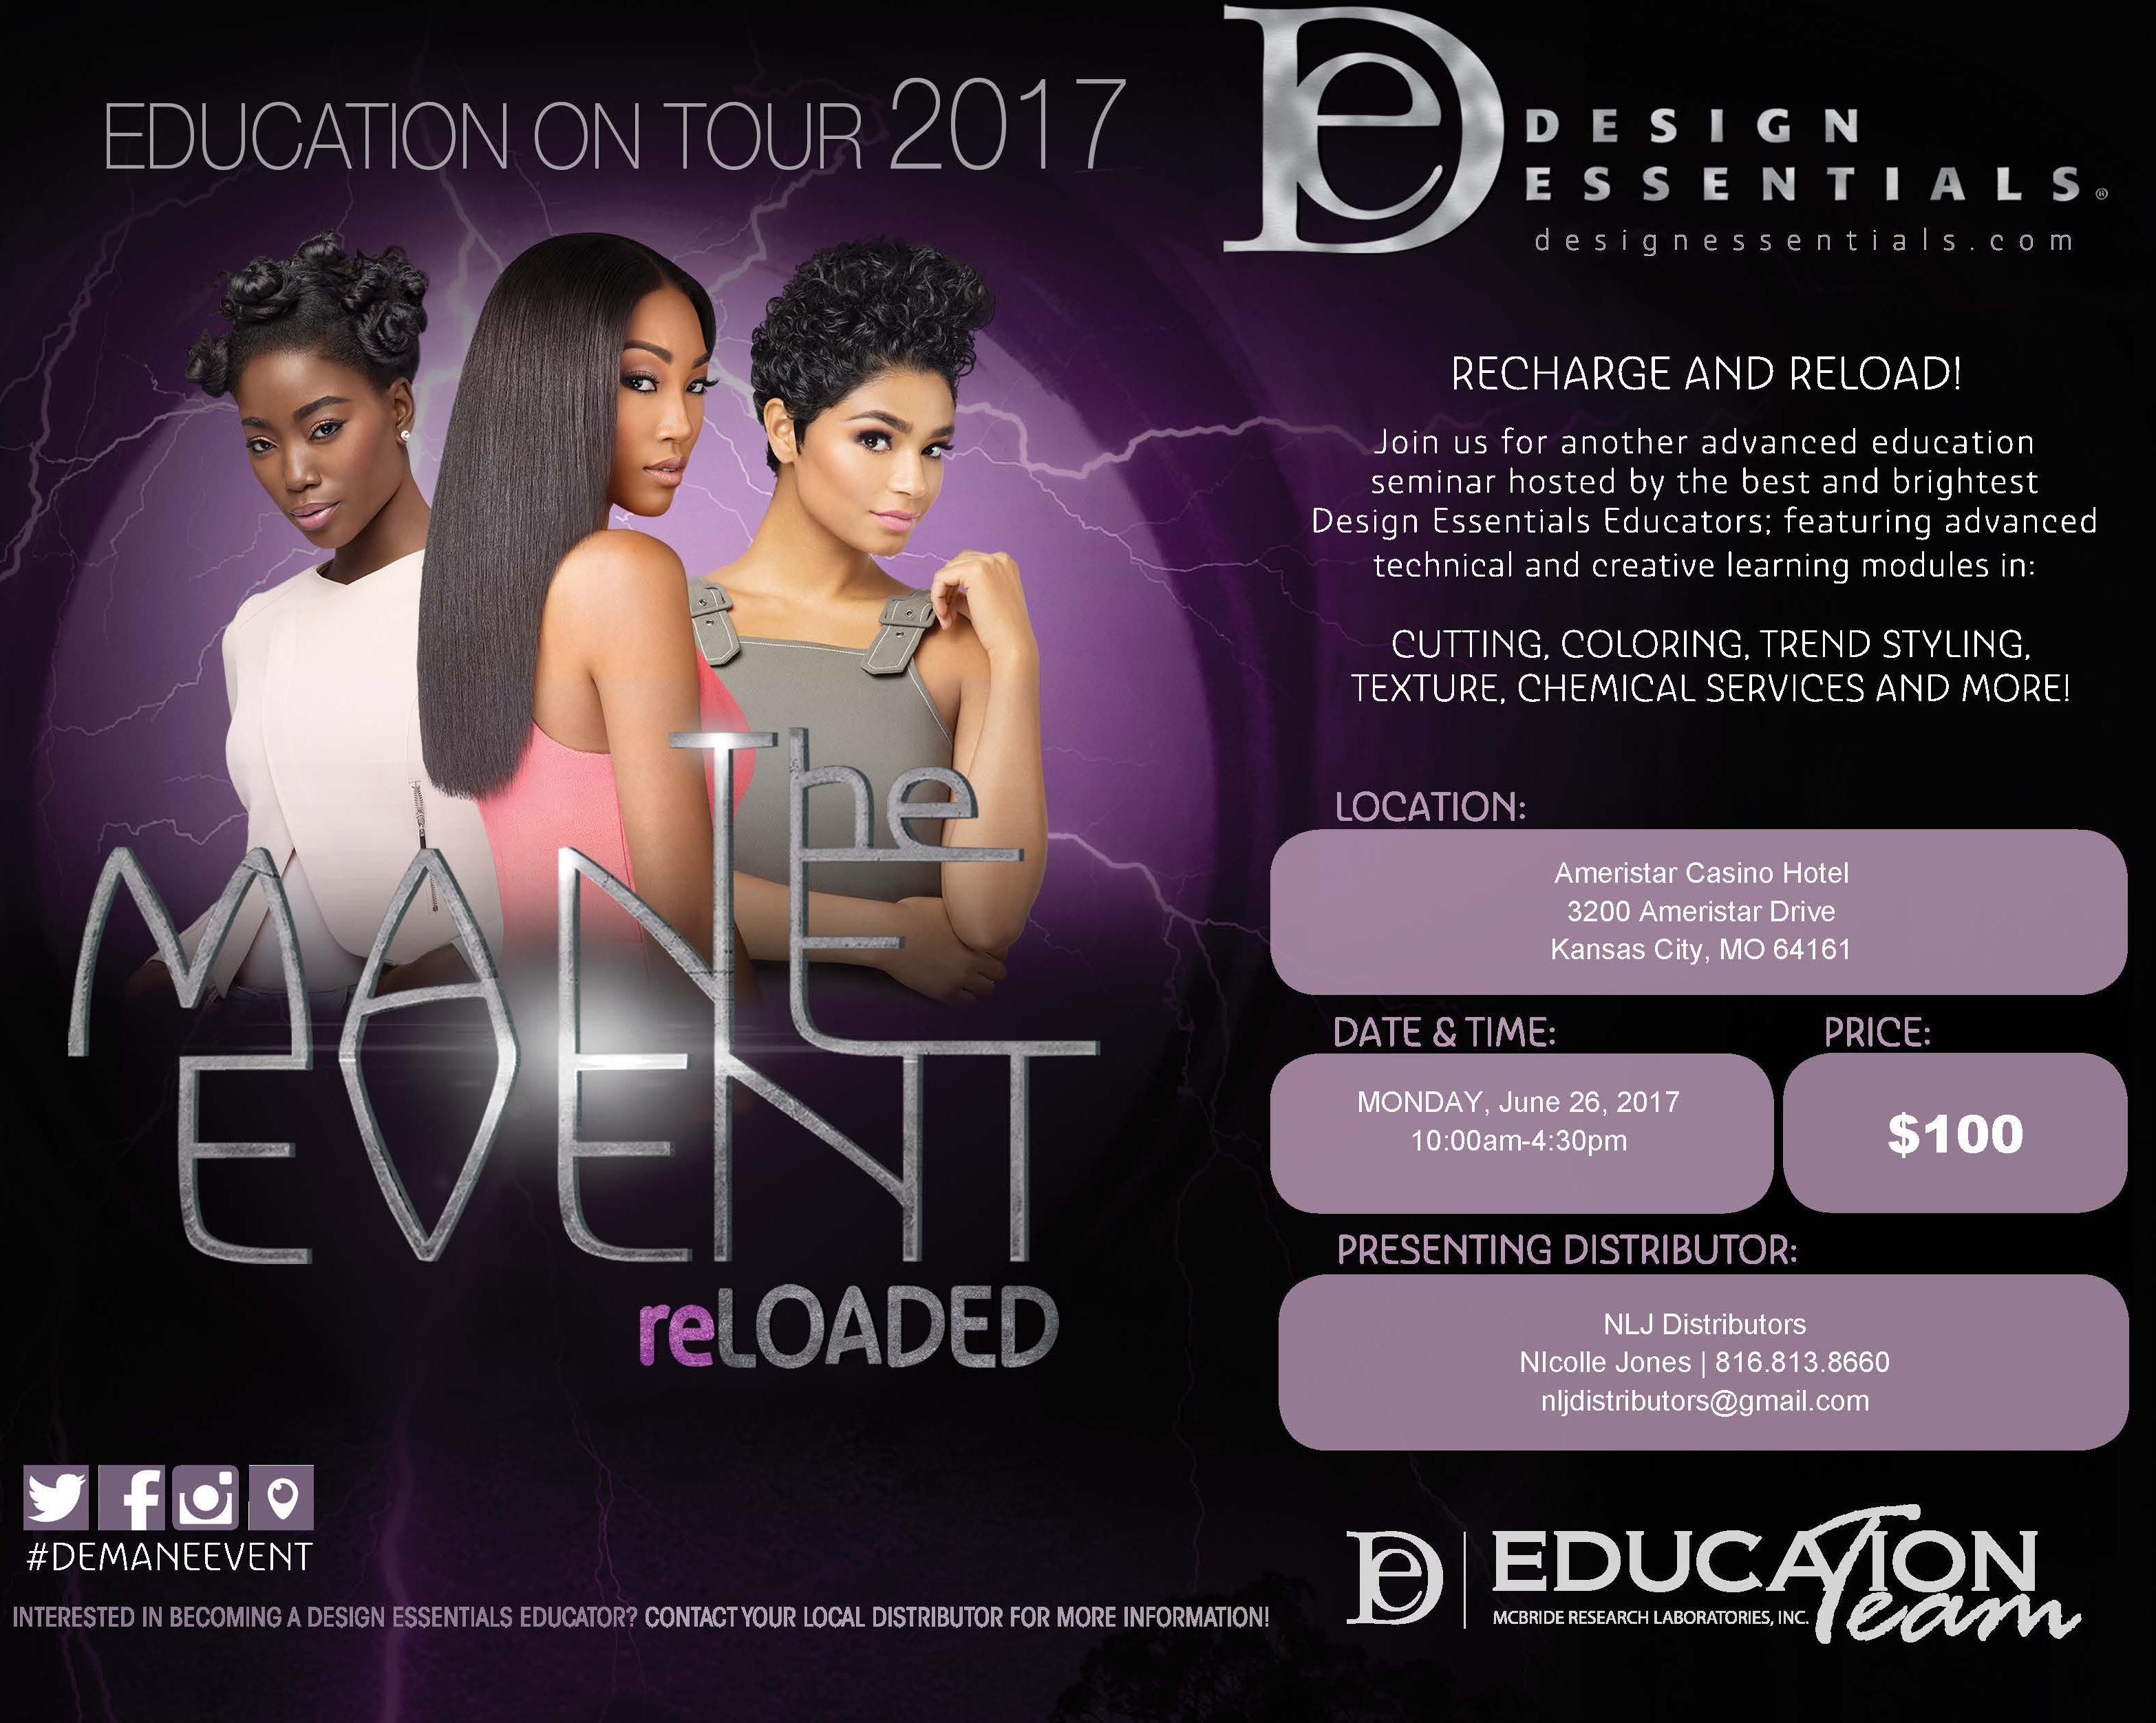 THE MAIN EVENT- DESIGN ESSENTIALS EDUCATIONAL